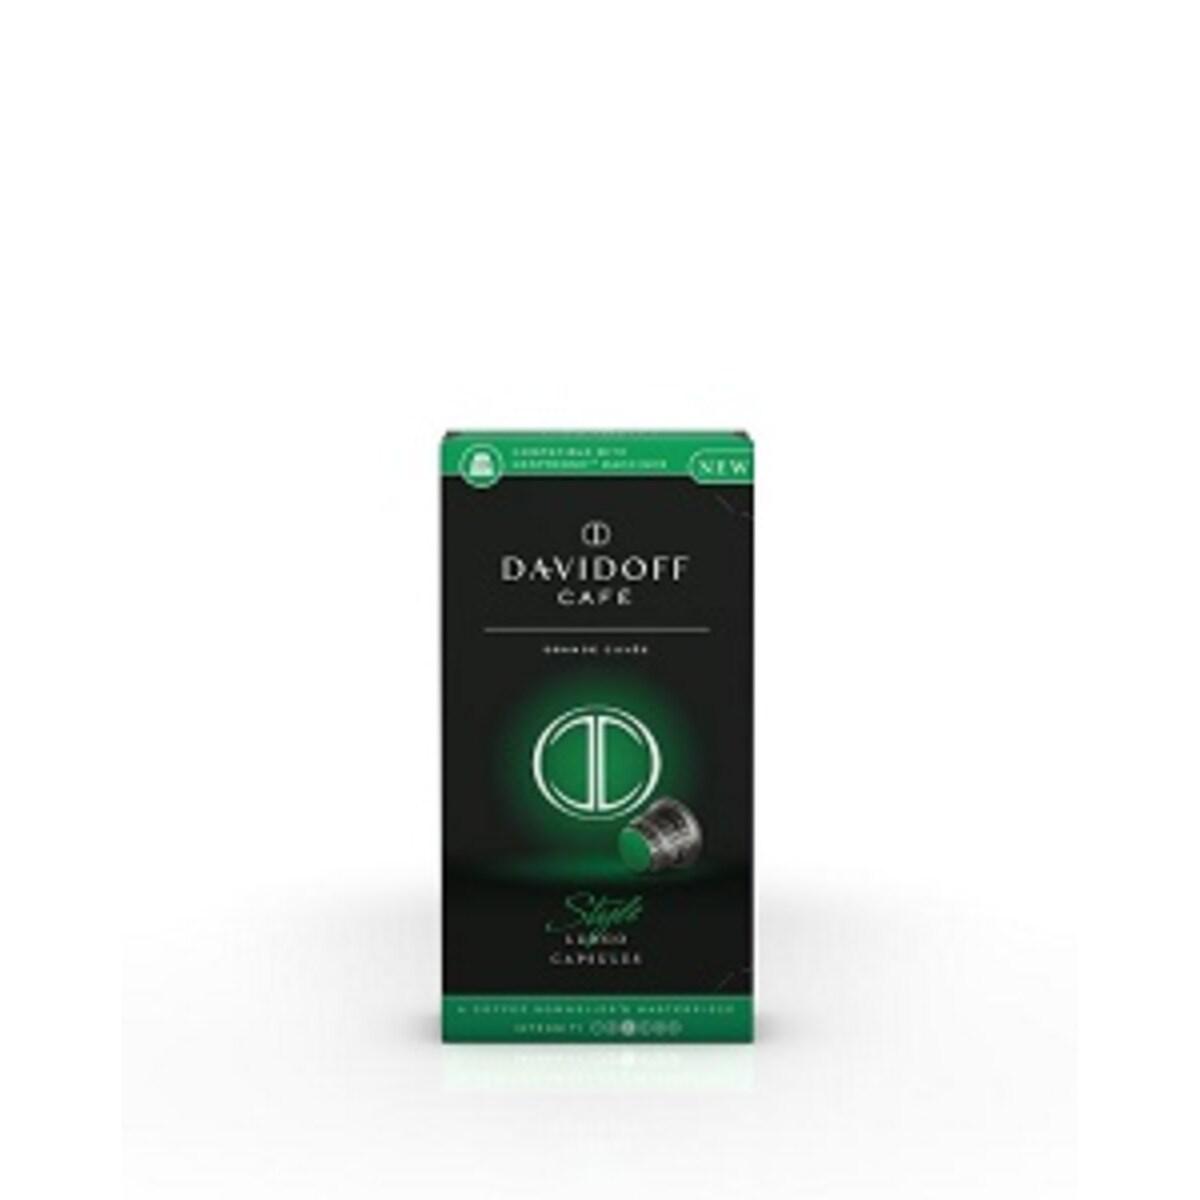 Davidoff Cafe Style Lungo - 100 бр Nespresso съвместими капсули